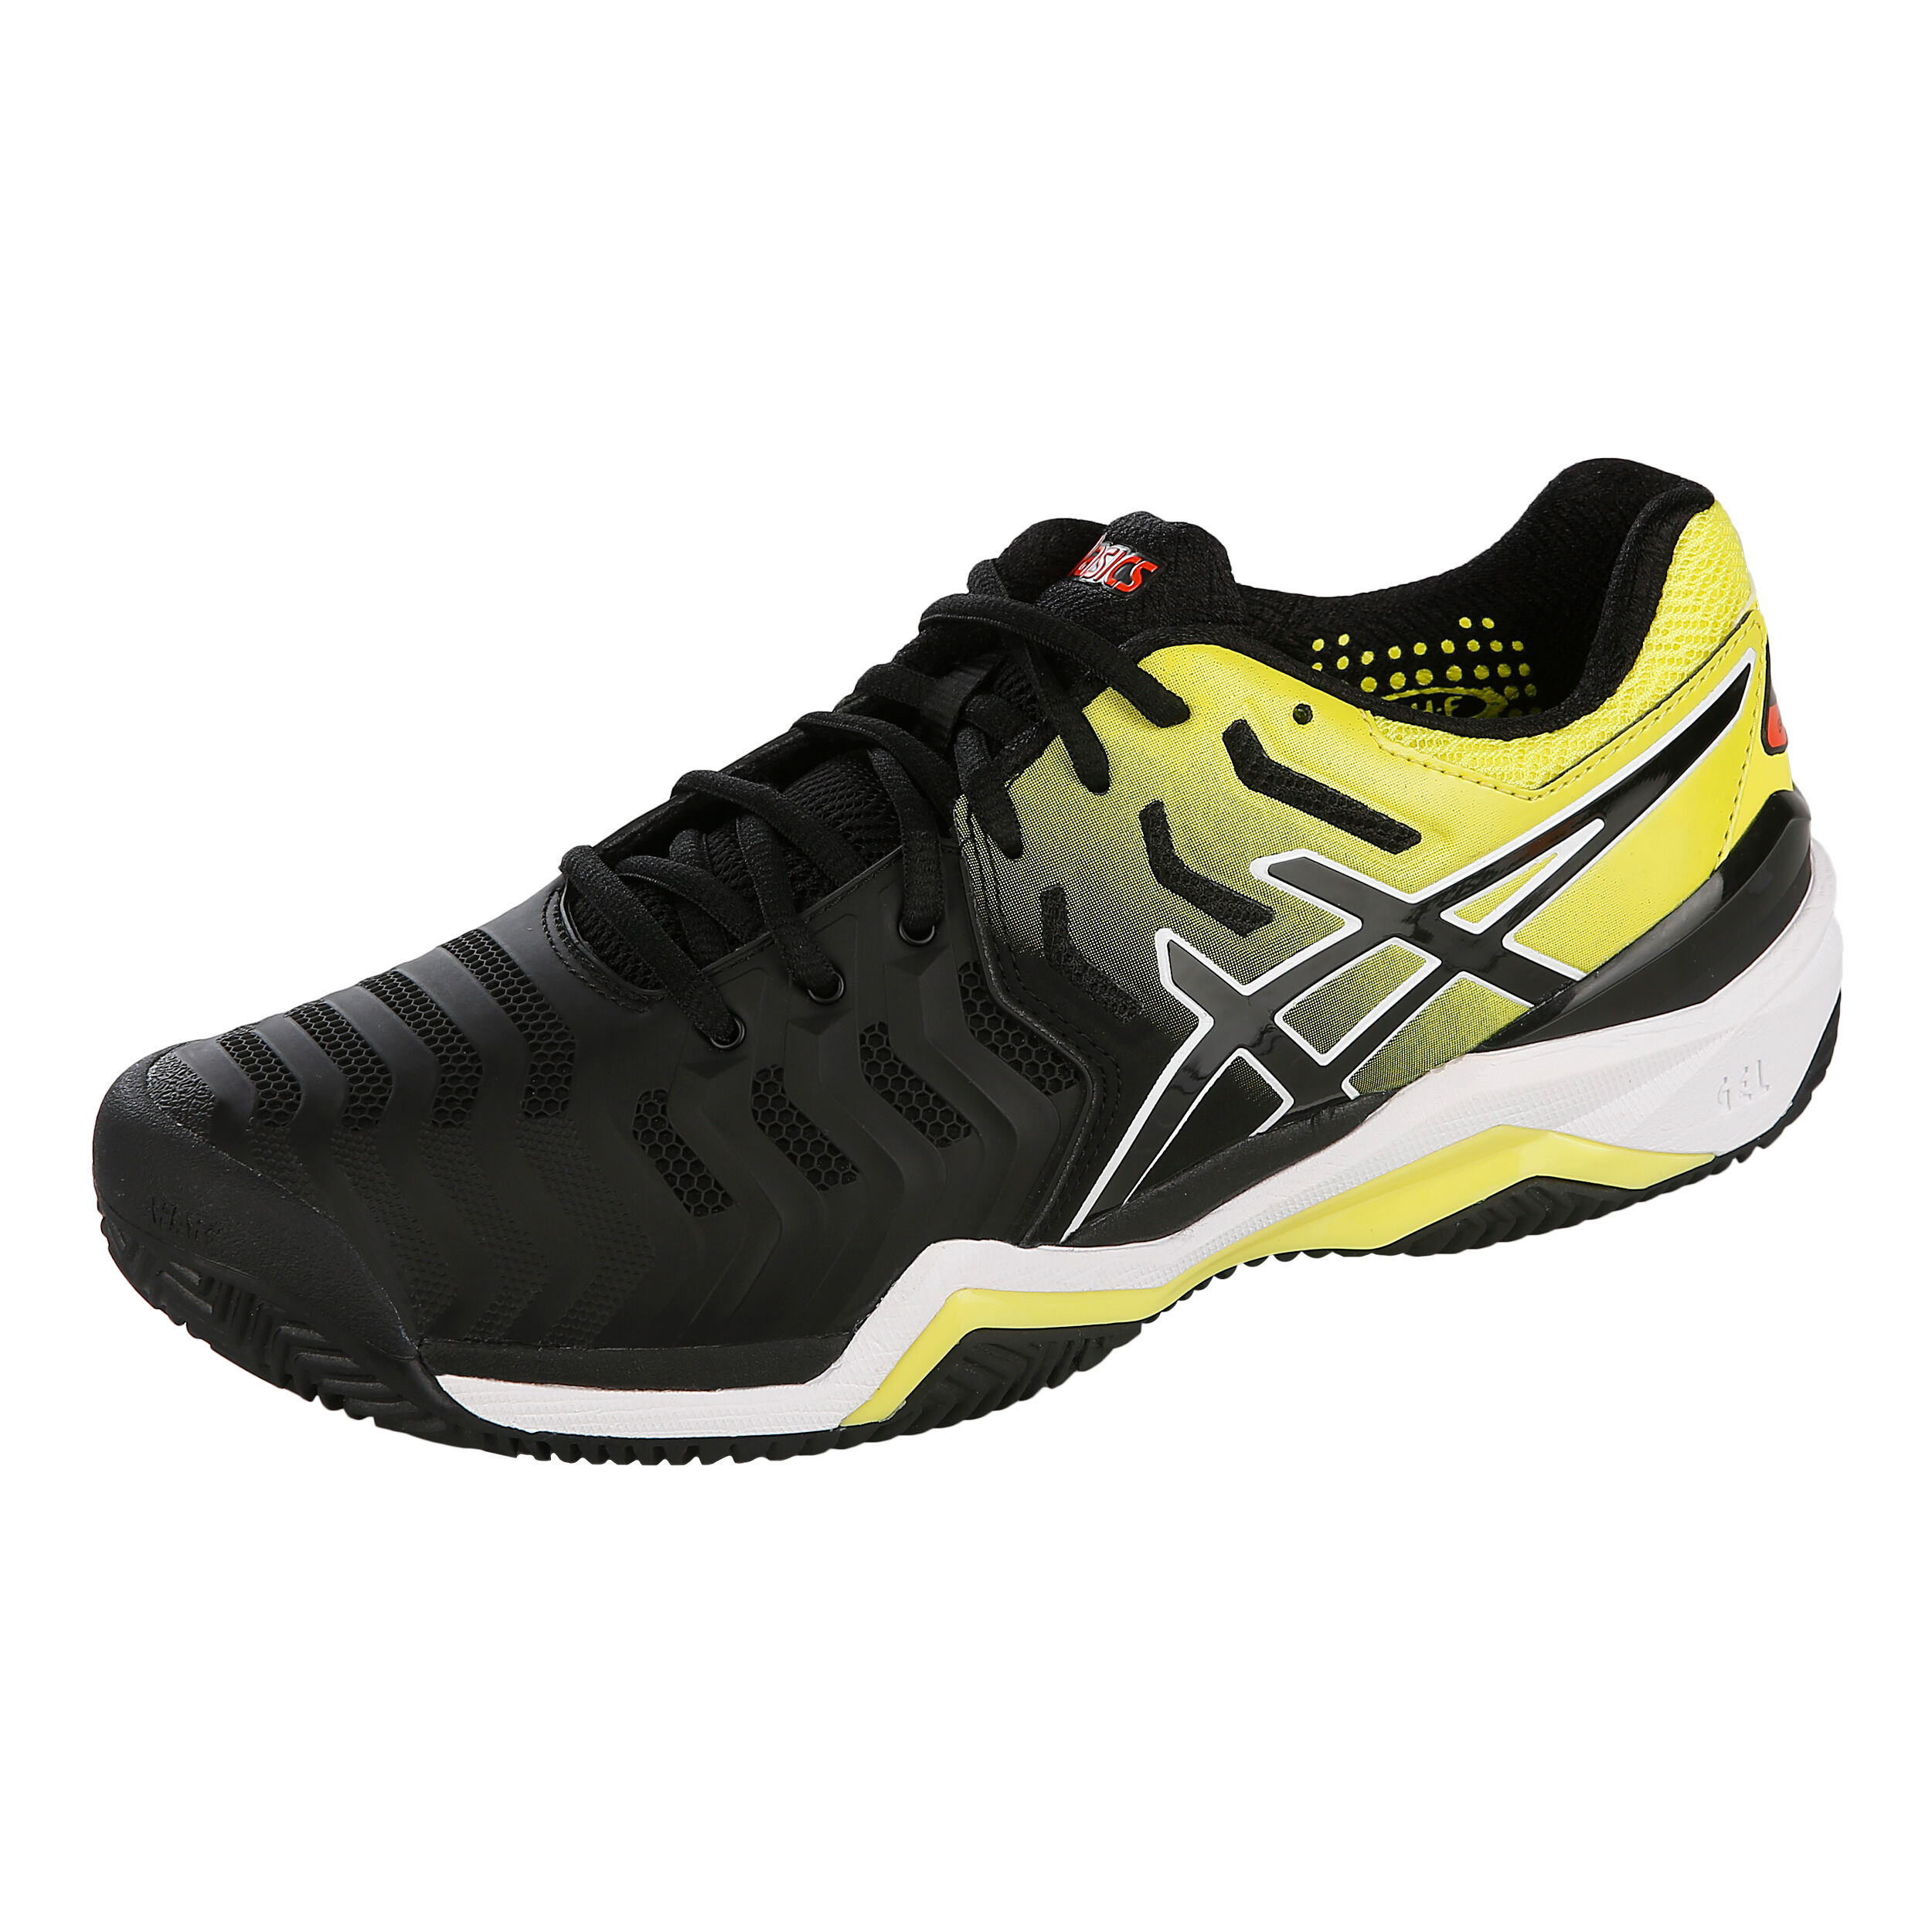 scarpe da tennis asics terra rossa